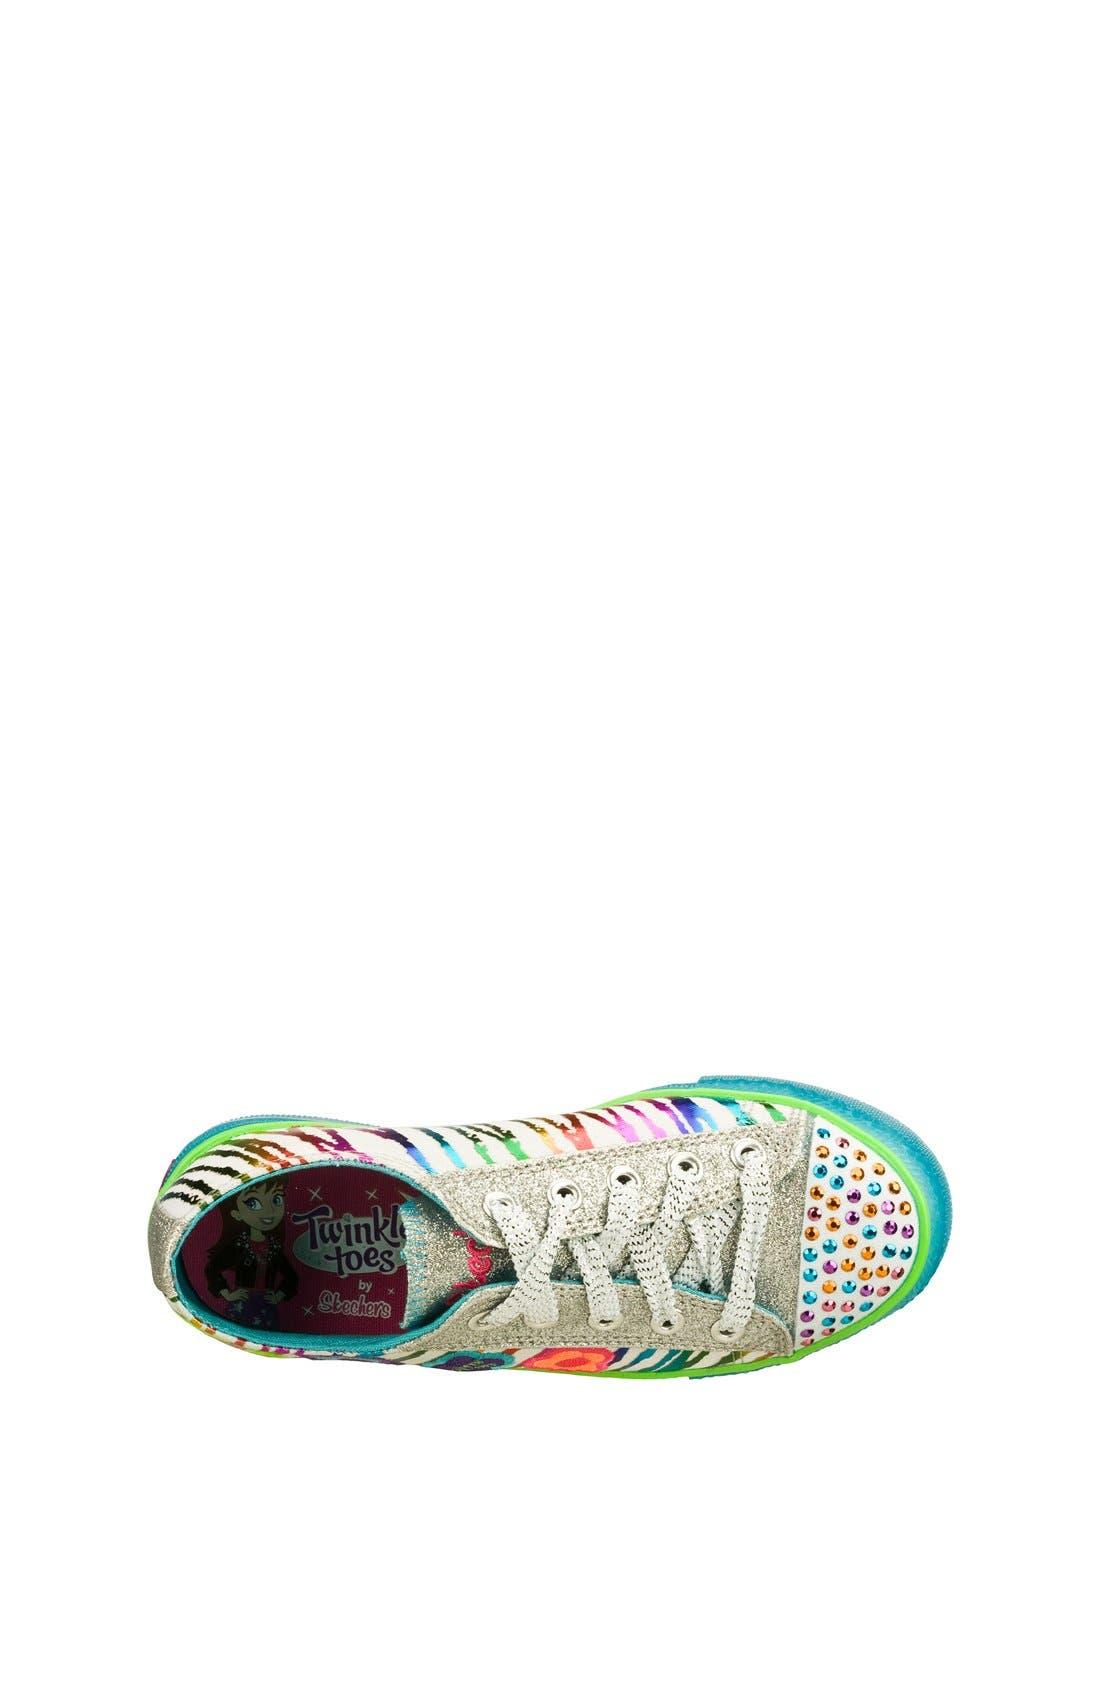 Alternate Image 3  - SKECHERS 'Boogie Lights' Sneaker (Toddler, Little Kid & Big Kid)